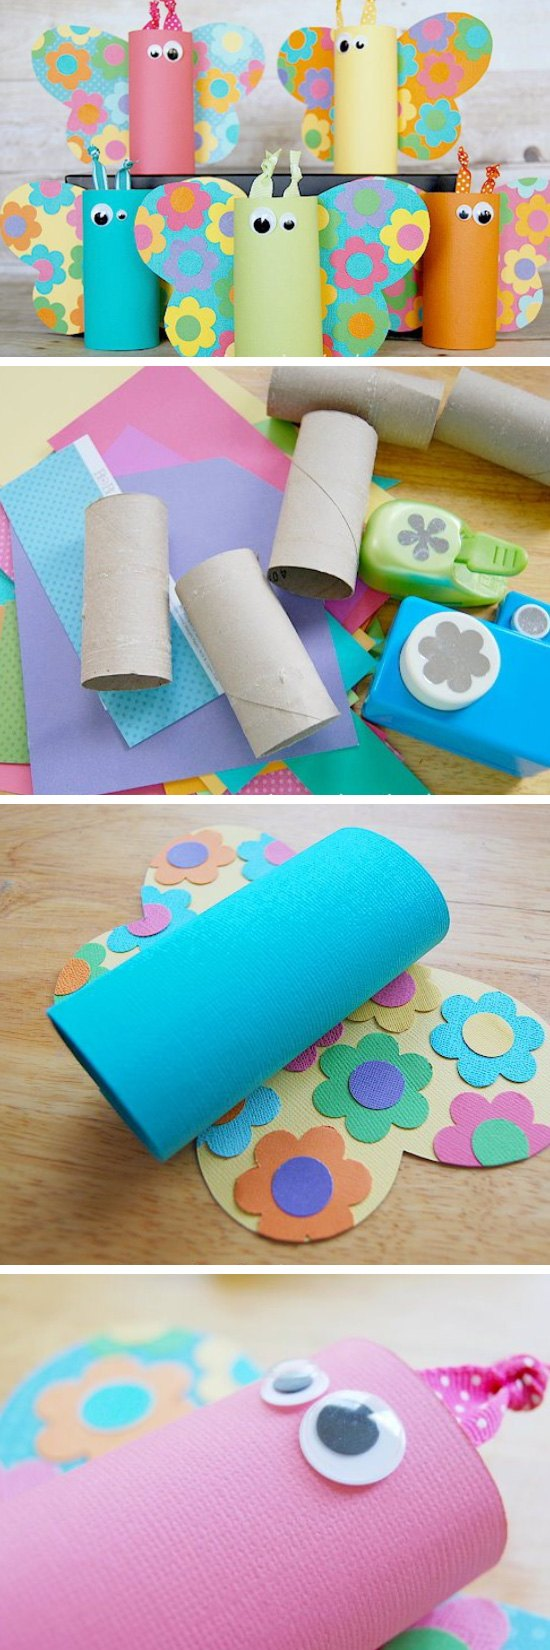 30 Easy Spring Craft Ideas Tutorials For Kids Page 18 Foliver Blog